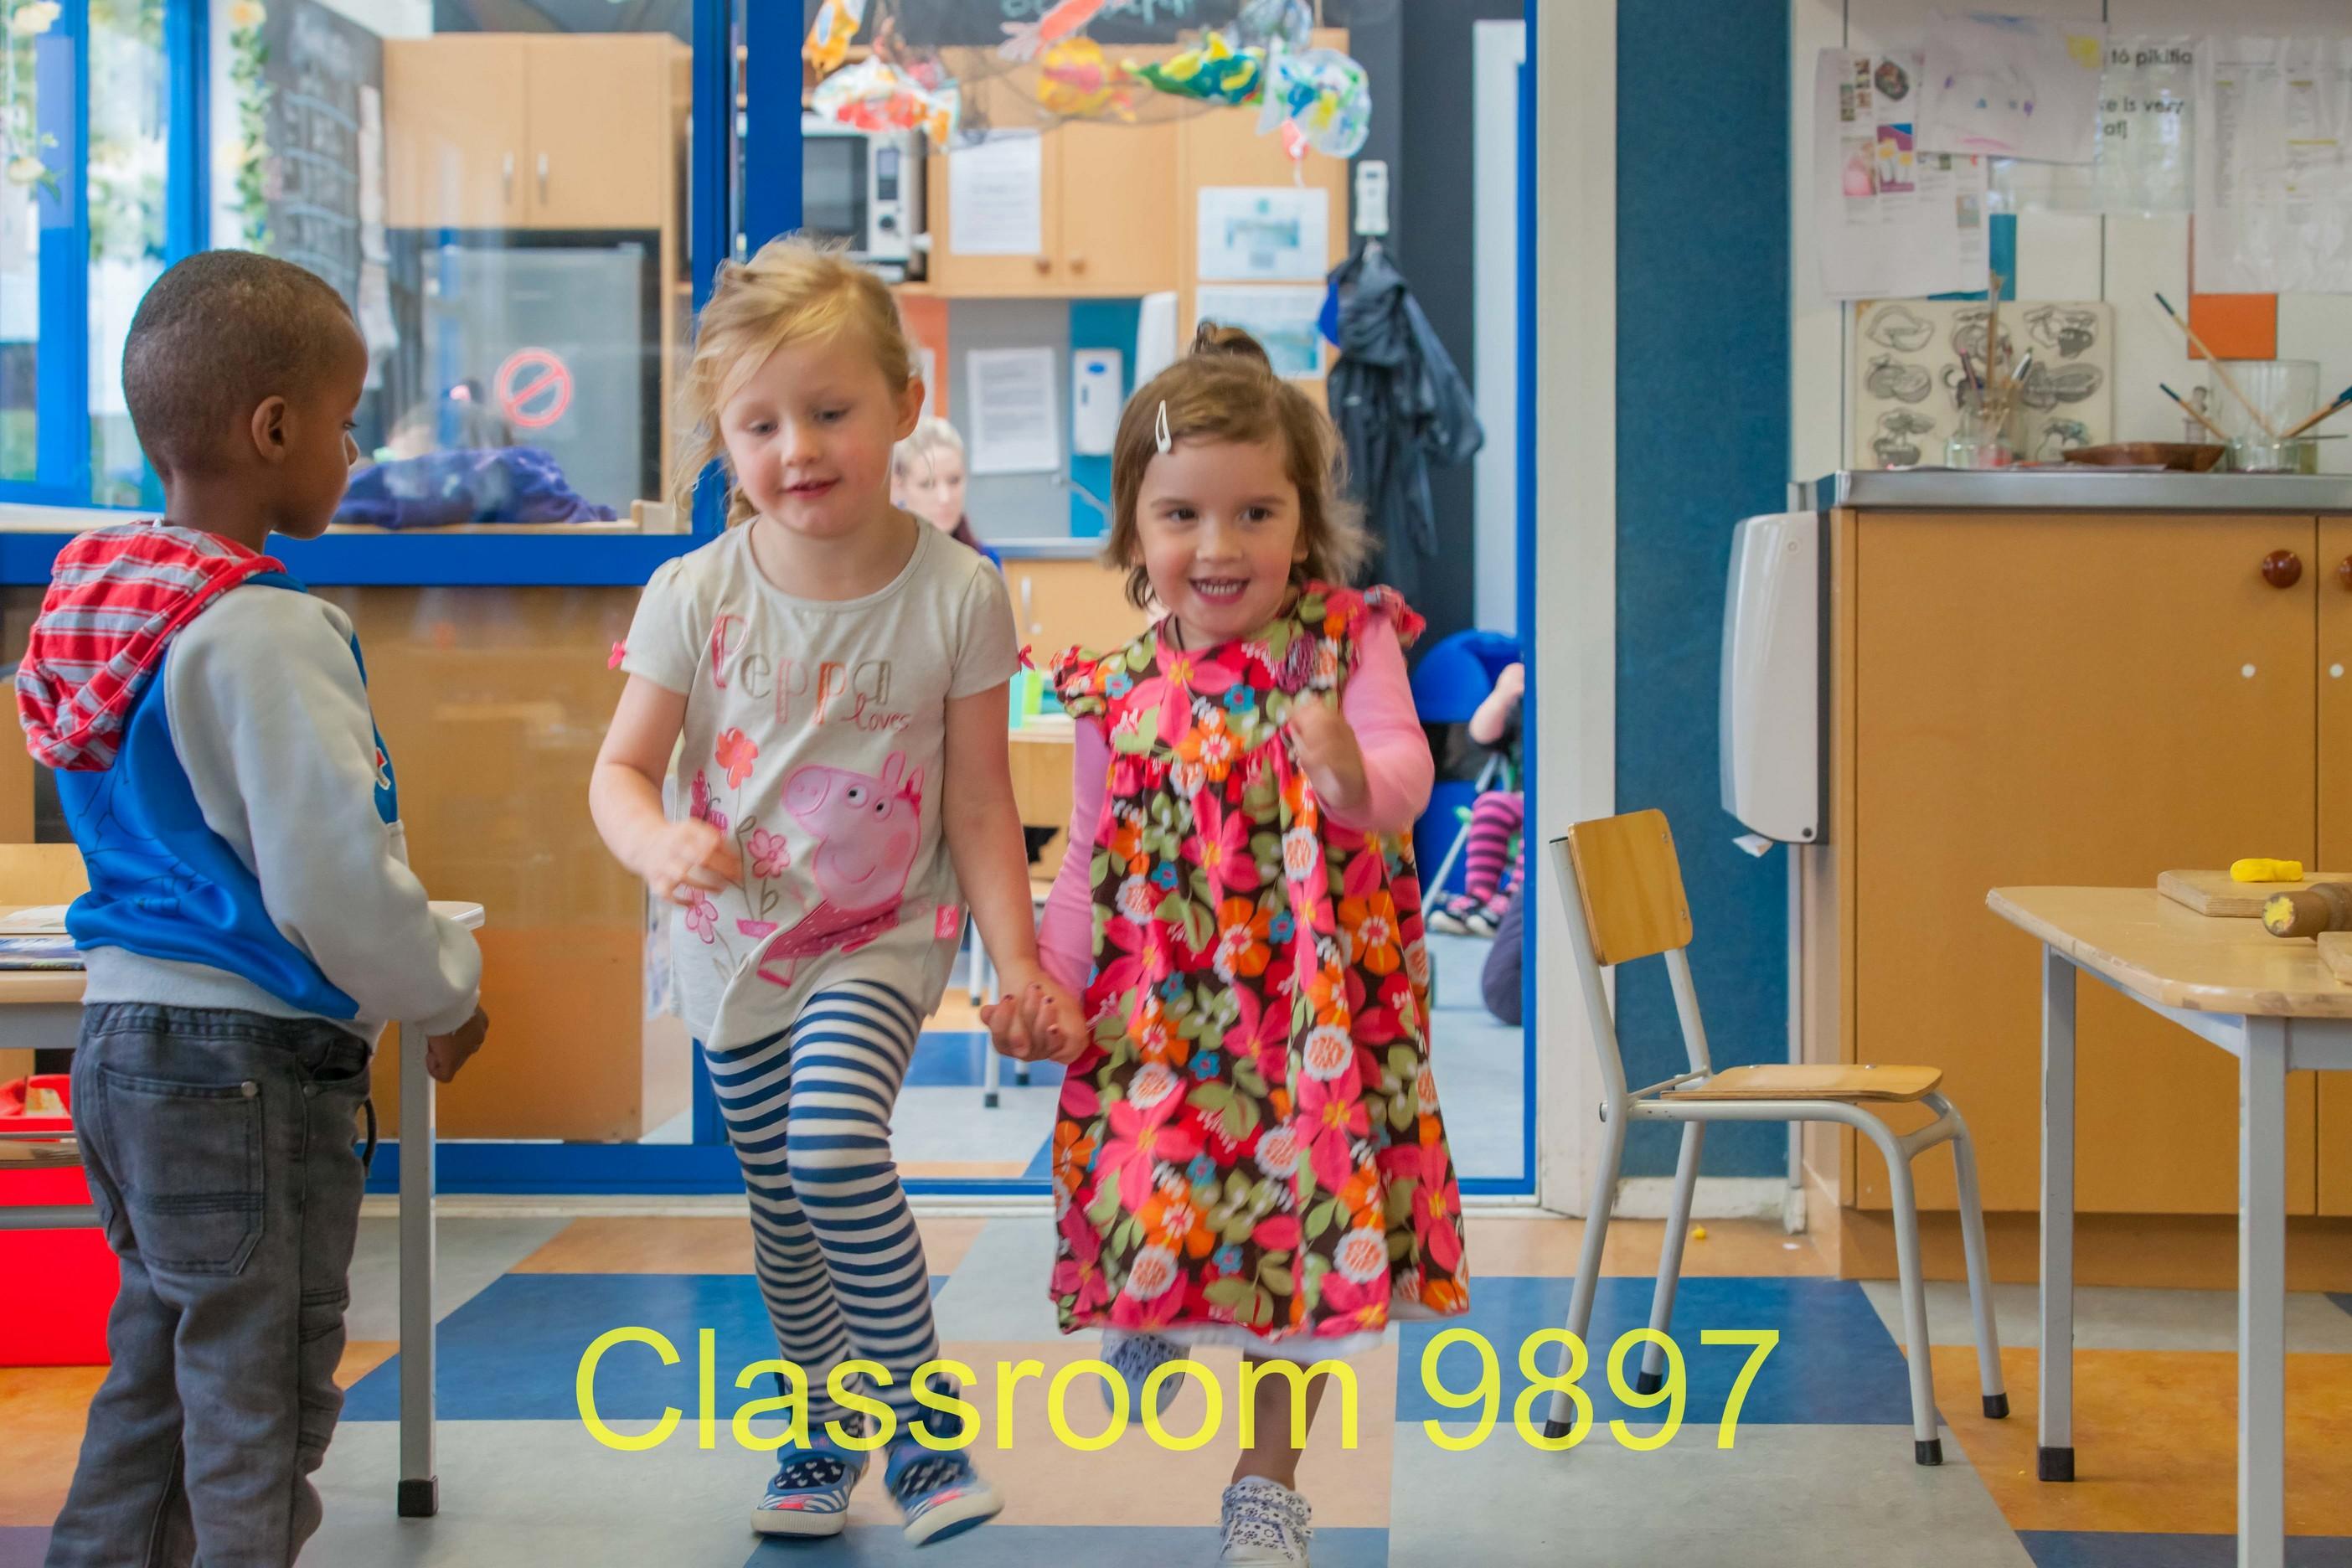 Classroom 9897